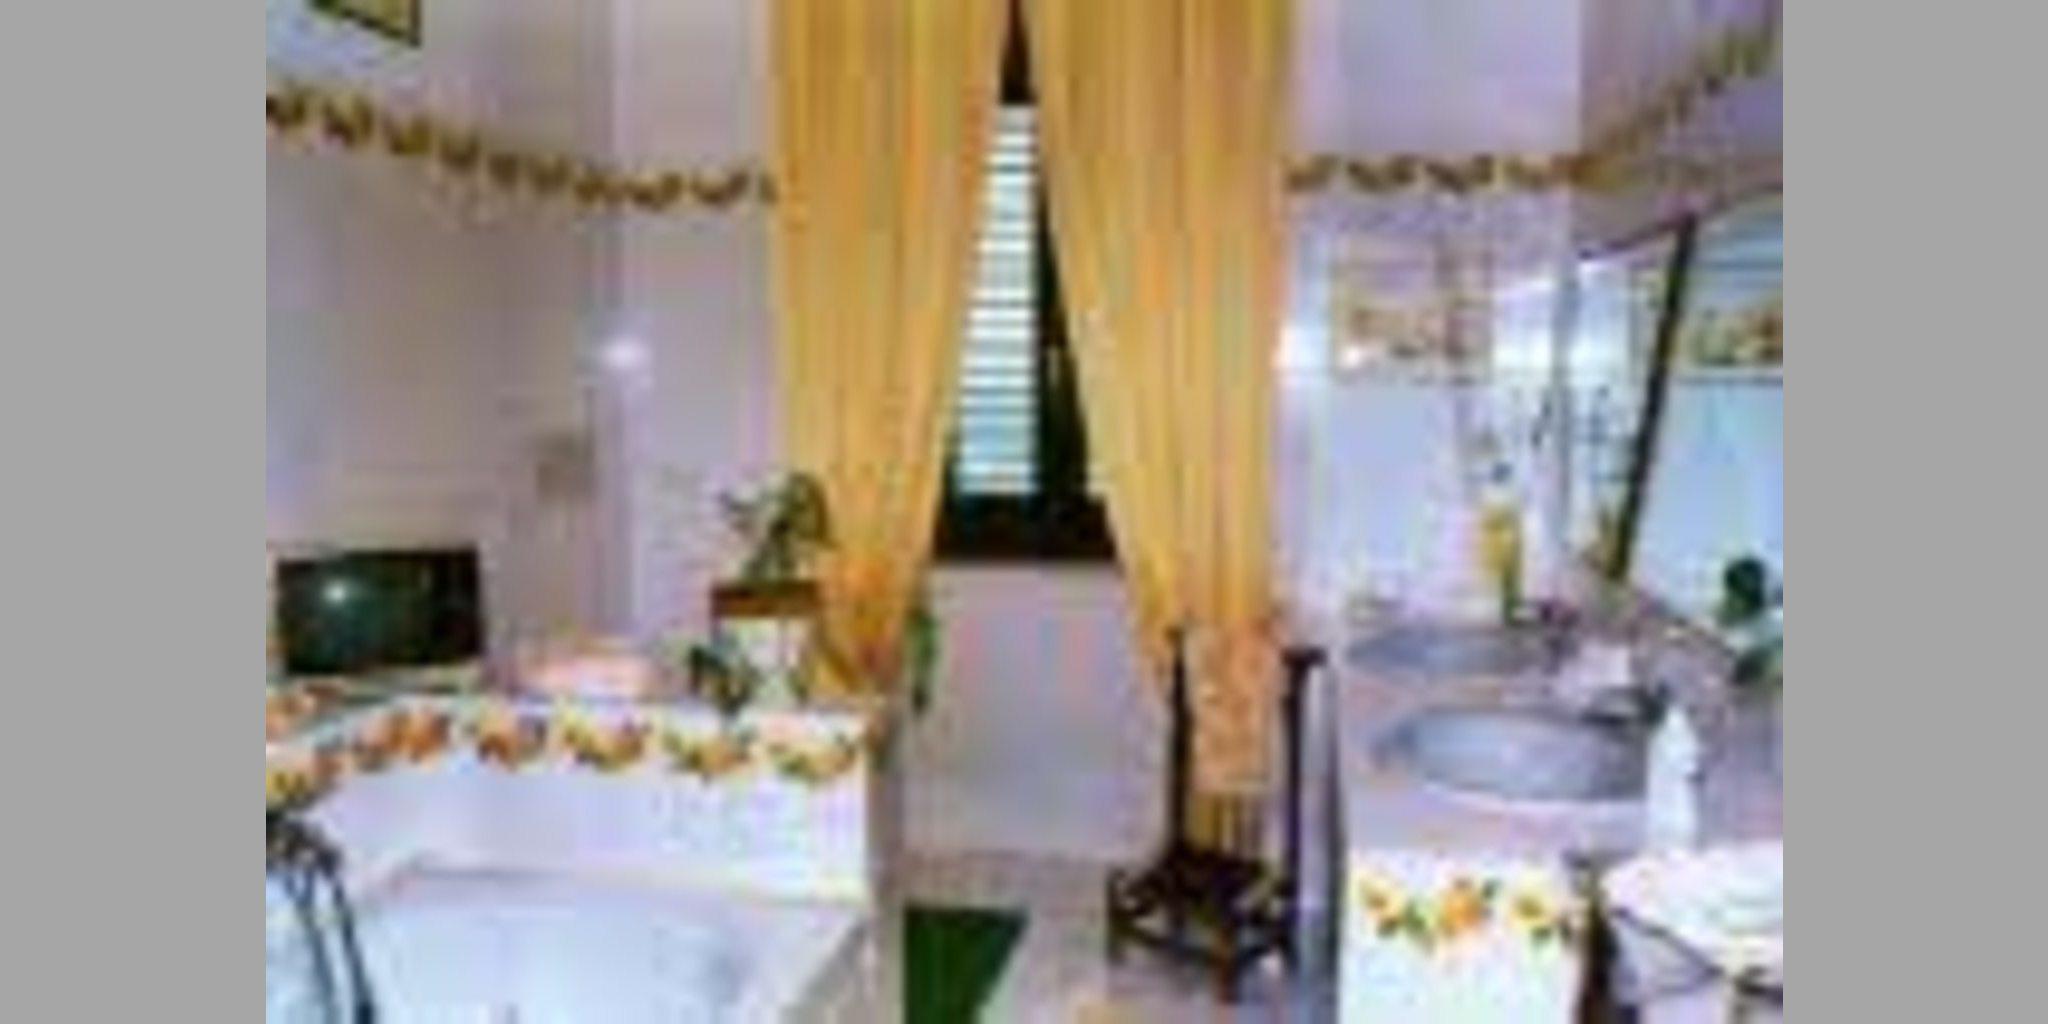 Bed & Breakfast Montecilfone - Cardarelli